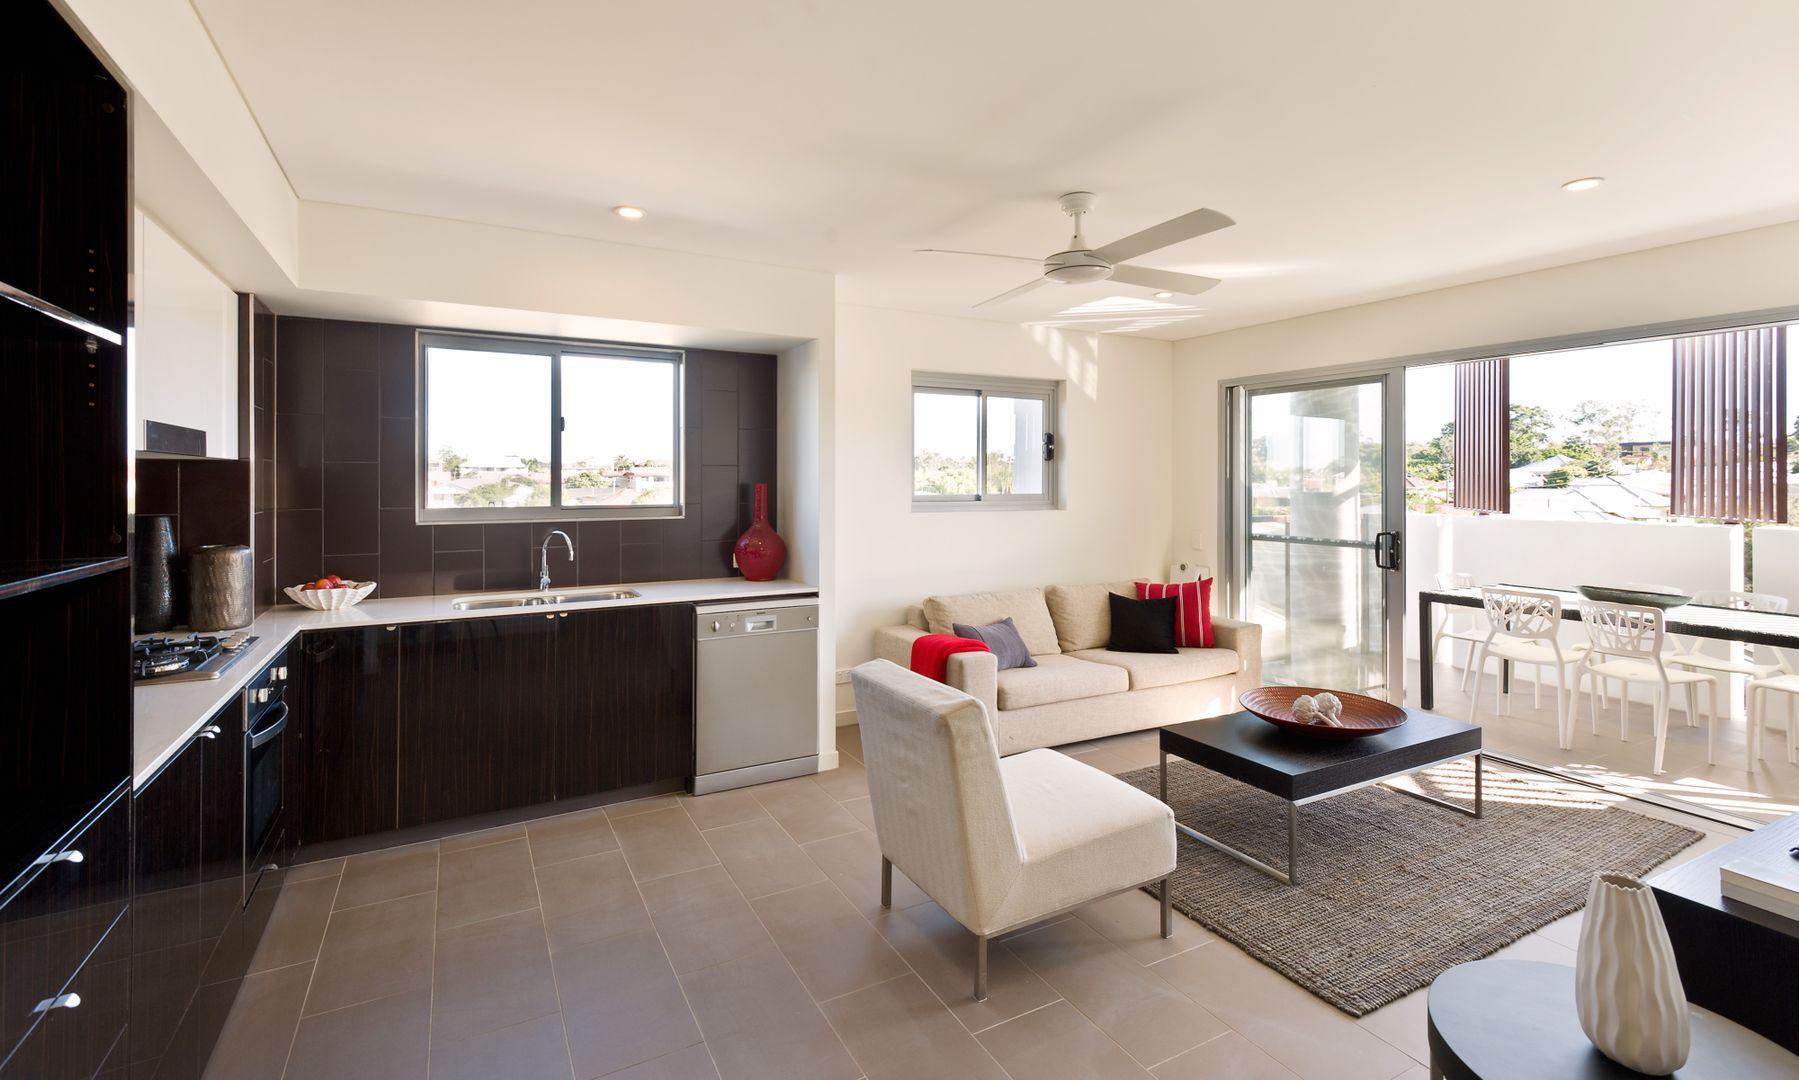 2 bedrooms Apartment / Unit / Flat in 704/428 Hamilton Road CHERMSIDE QLD, 4032